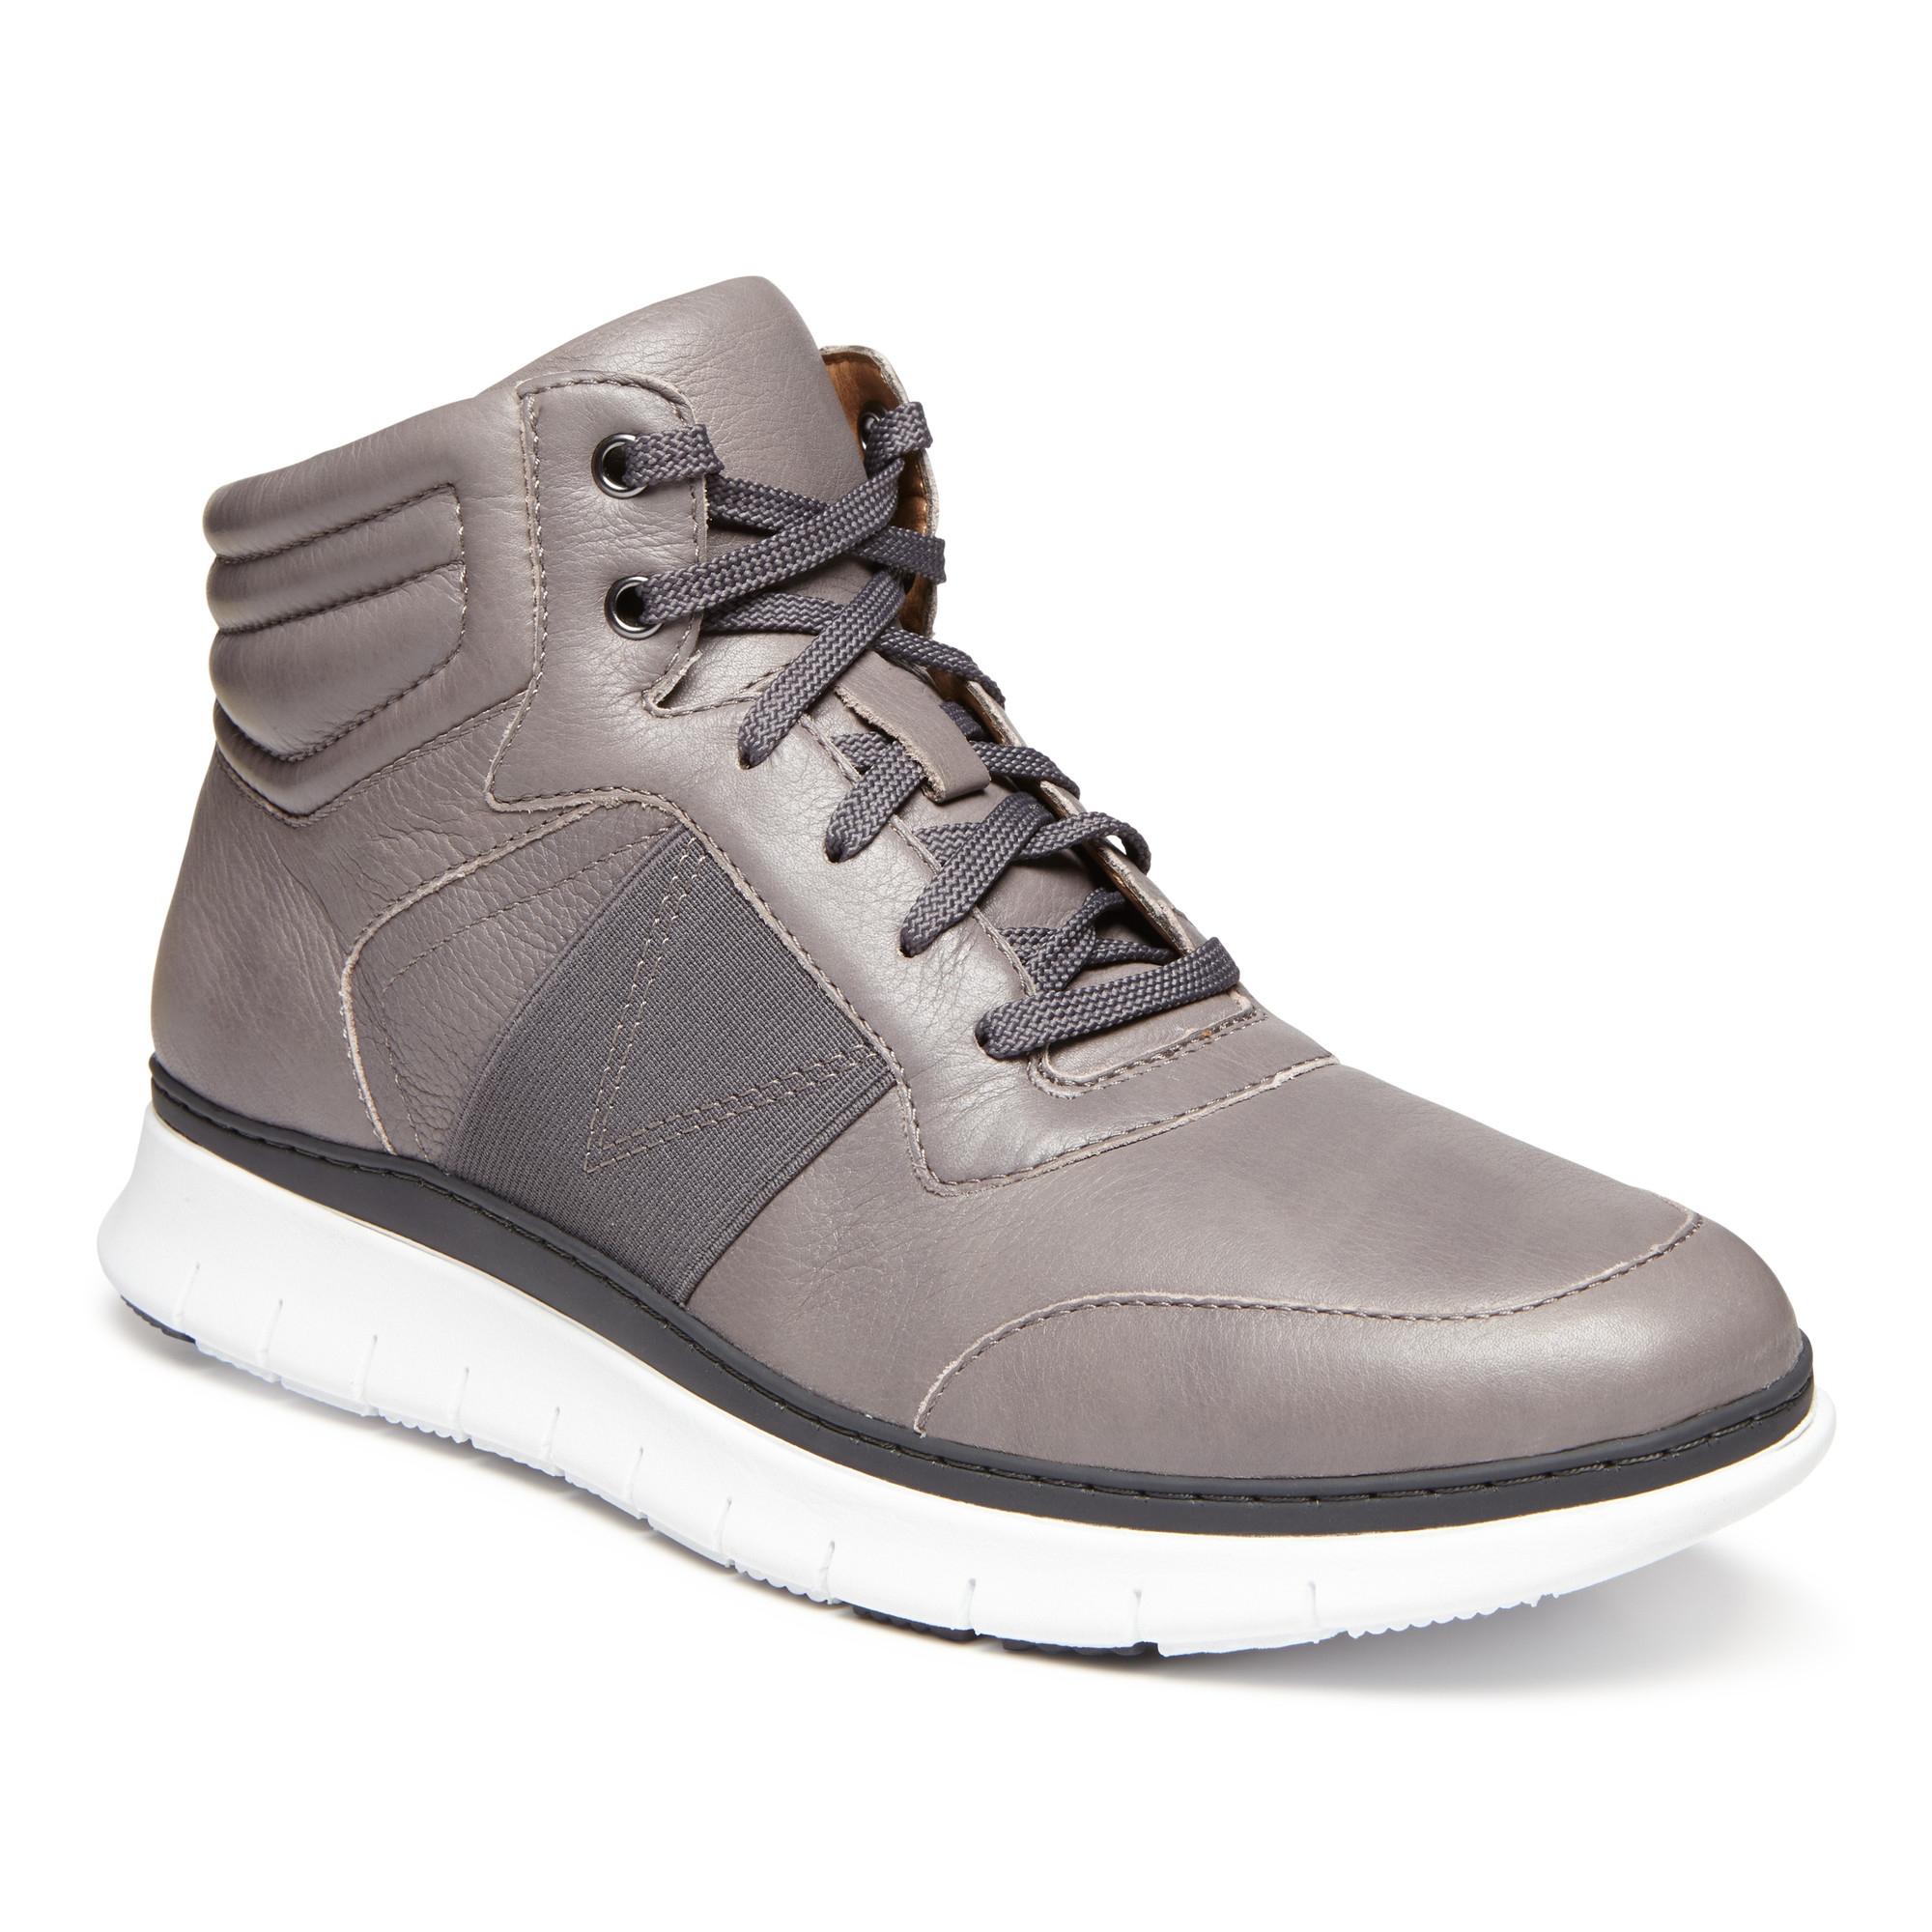 Jamal High-Top Sneaker | Vionic Shoes